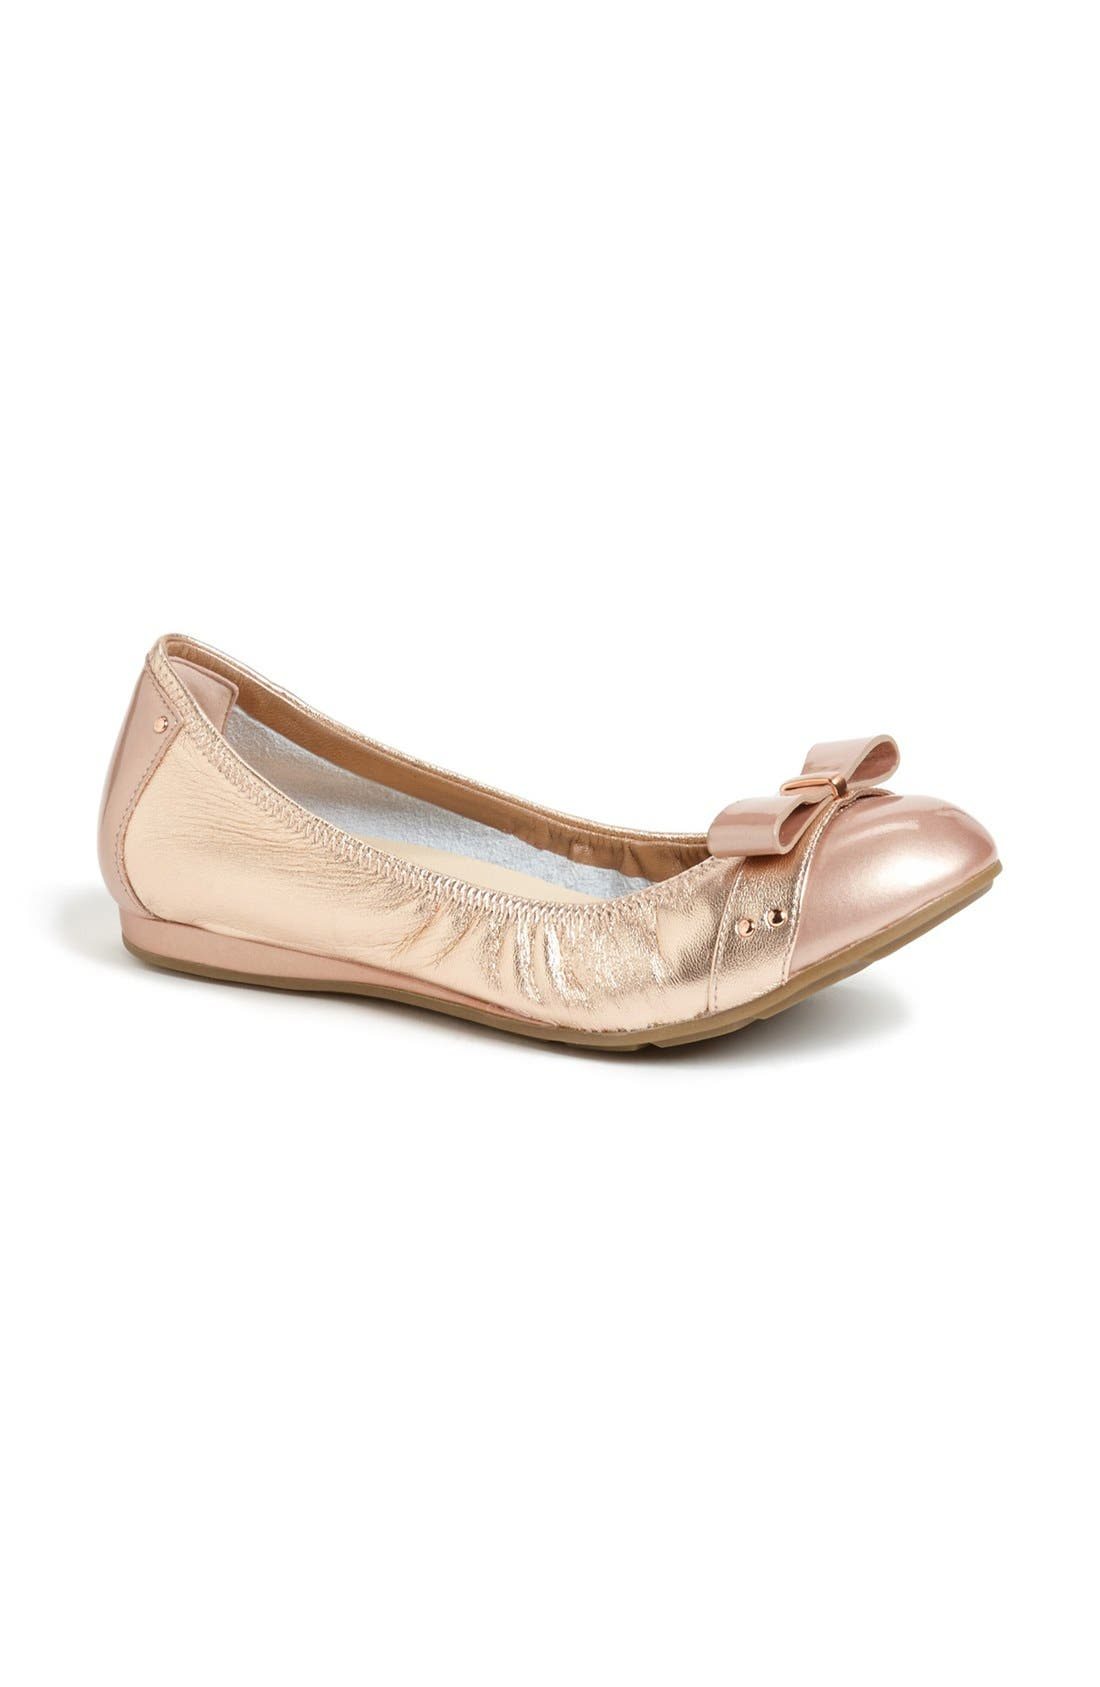 Main Image - Cole Haan 'Air Monica' Ballet Flat